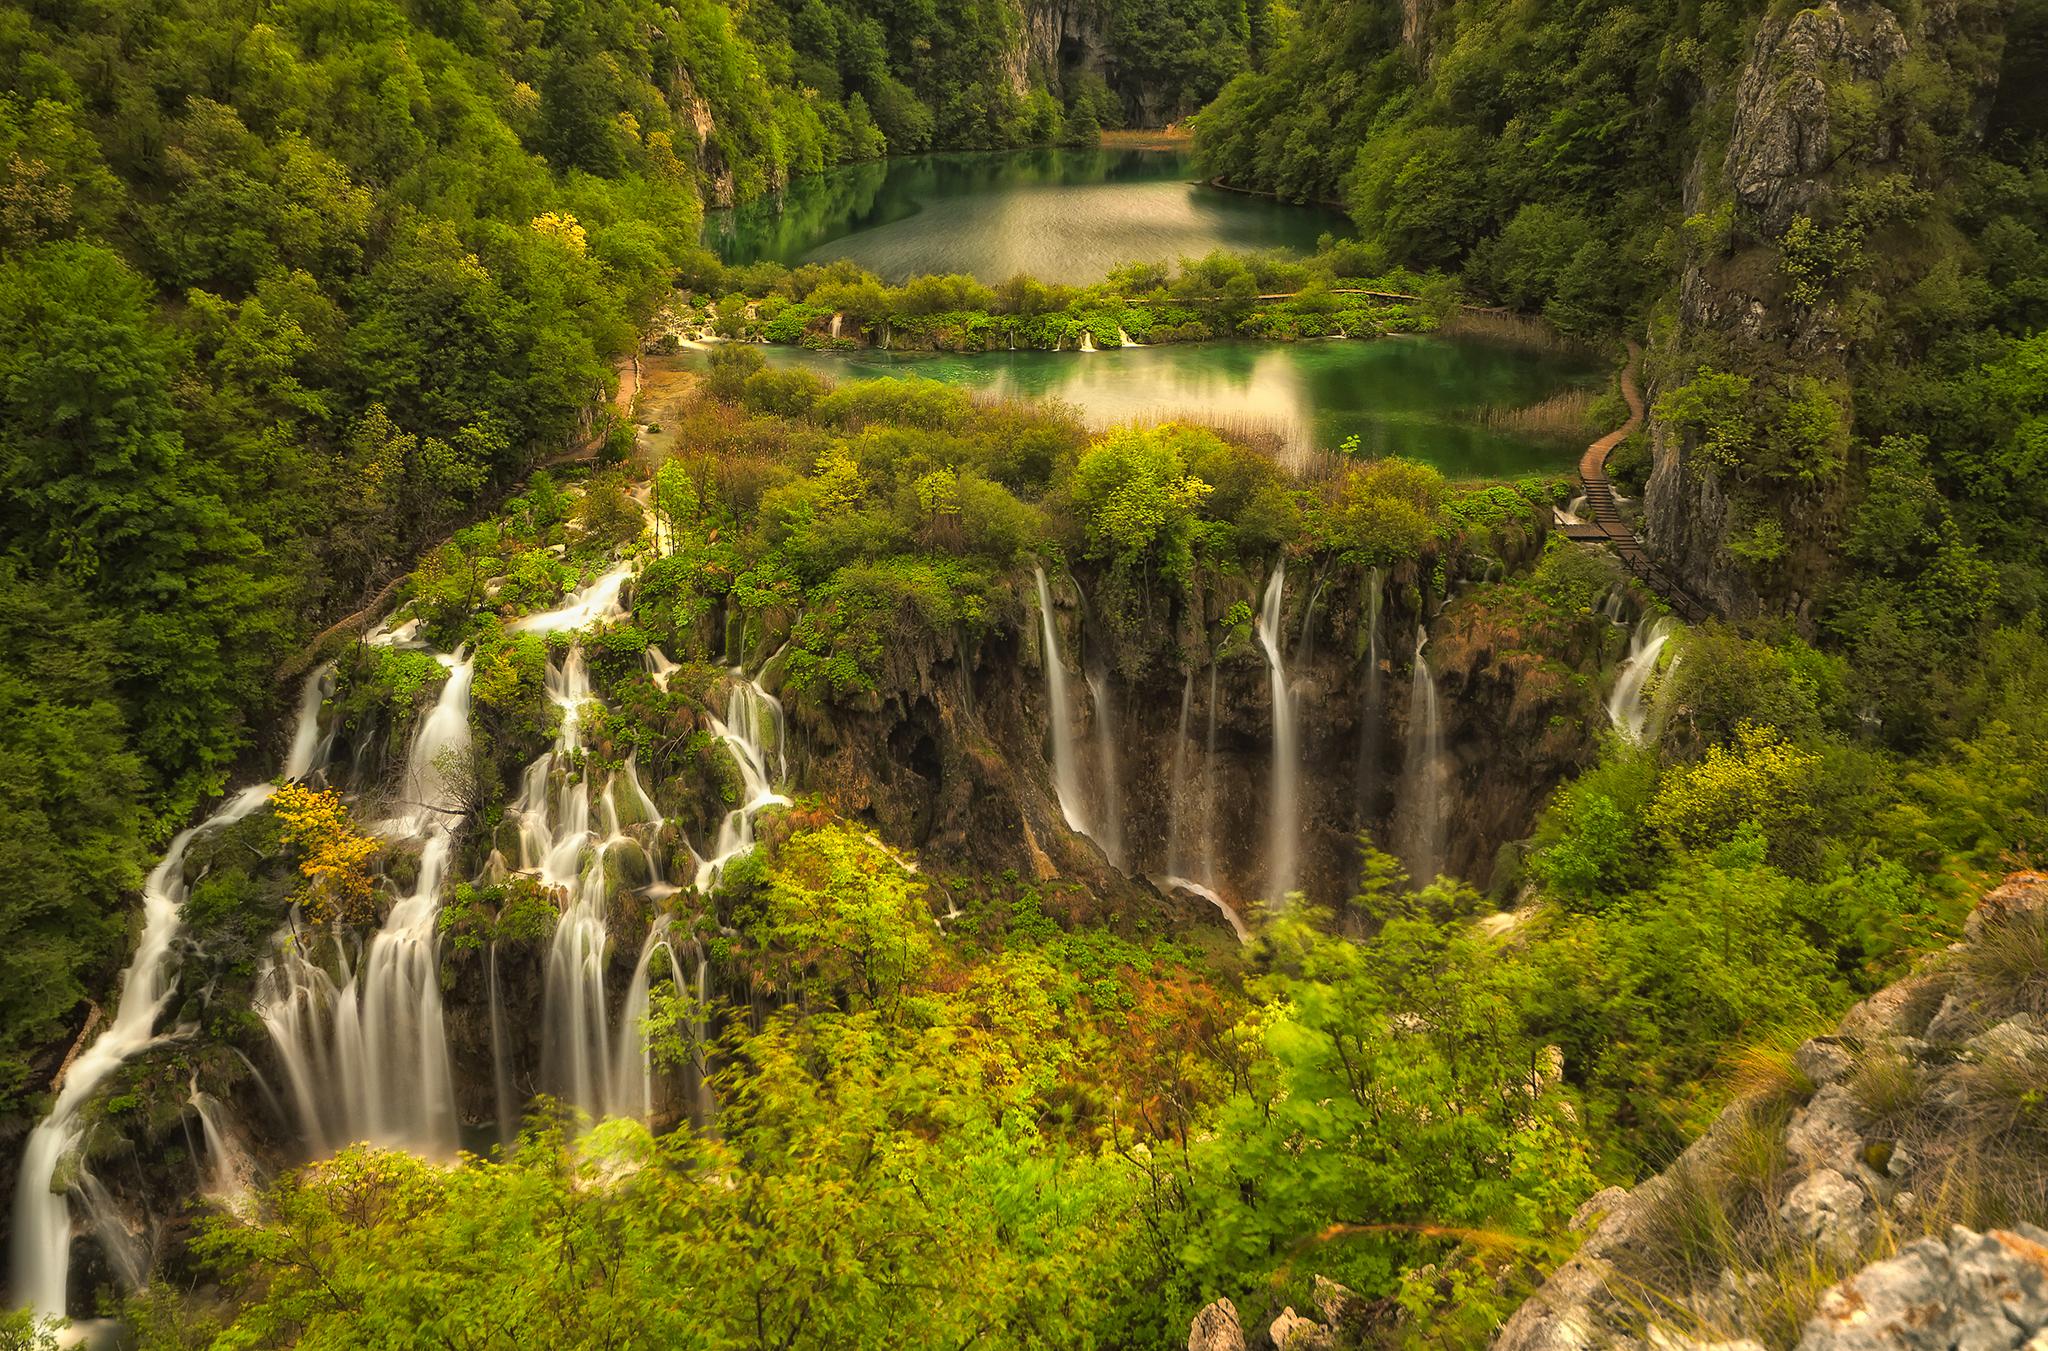 Plitvice lake national park hd wallpaper background image 2048x1351 id 727664 wallpaper - Plitvice lakes hd ...